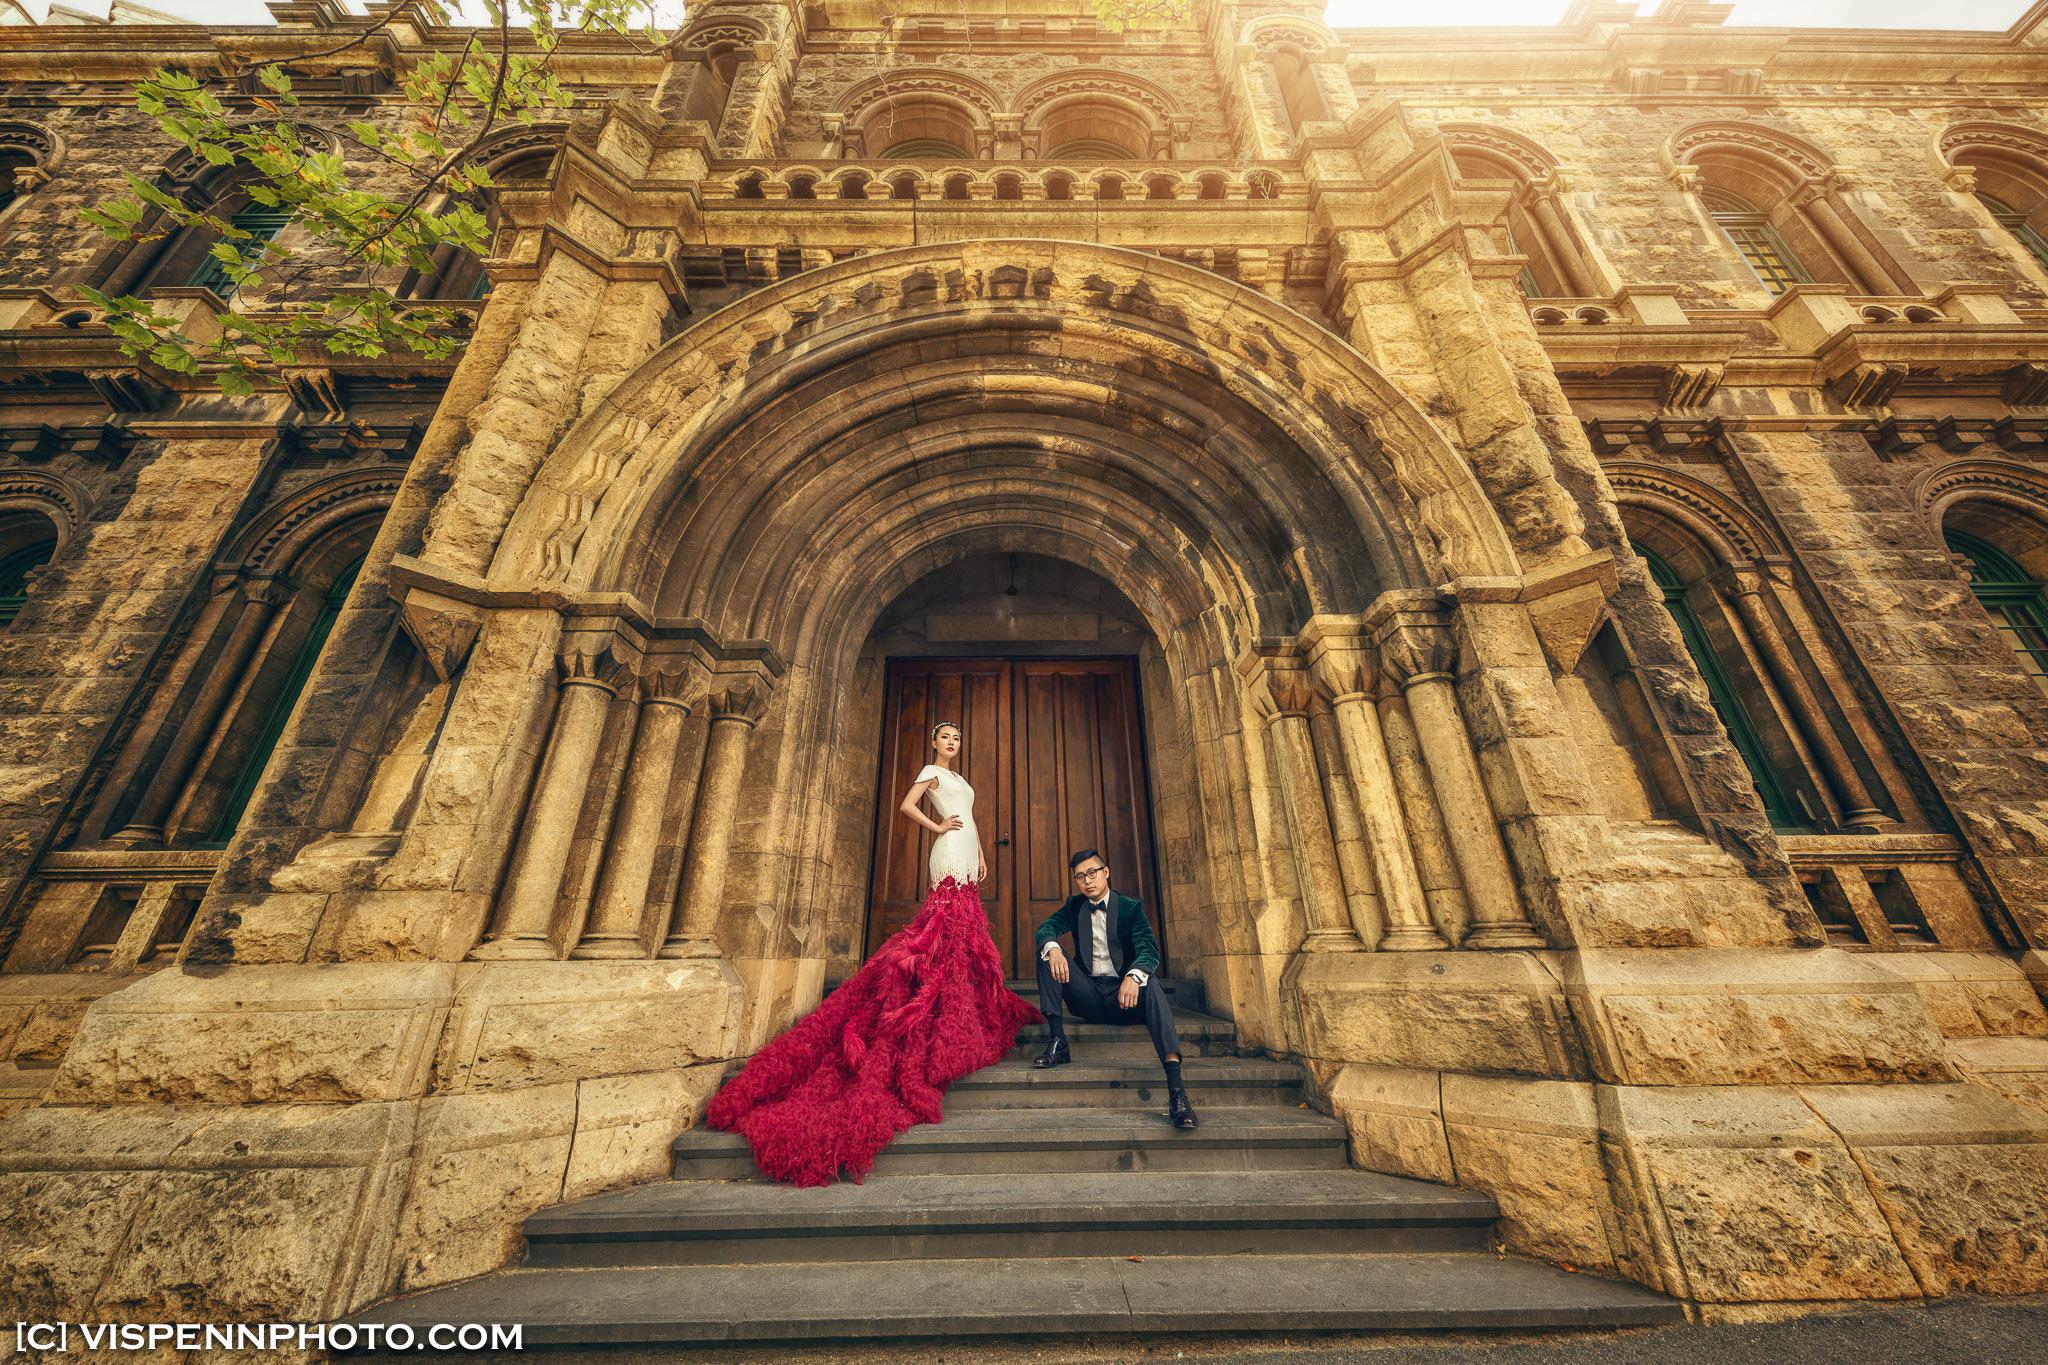 PRE WEDDING Photography Melbourne VISPENN 墨尔本 婚纱照 结婚照 婚纱摄影 VISPENN StacieYi PreWedding 5982 1